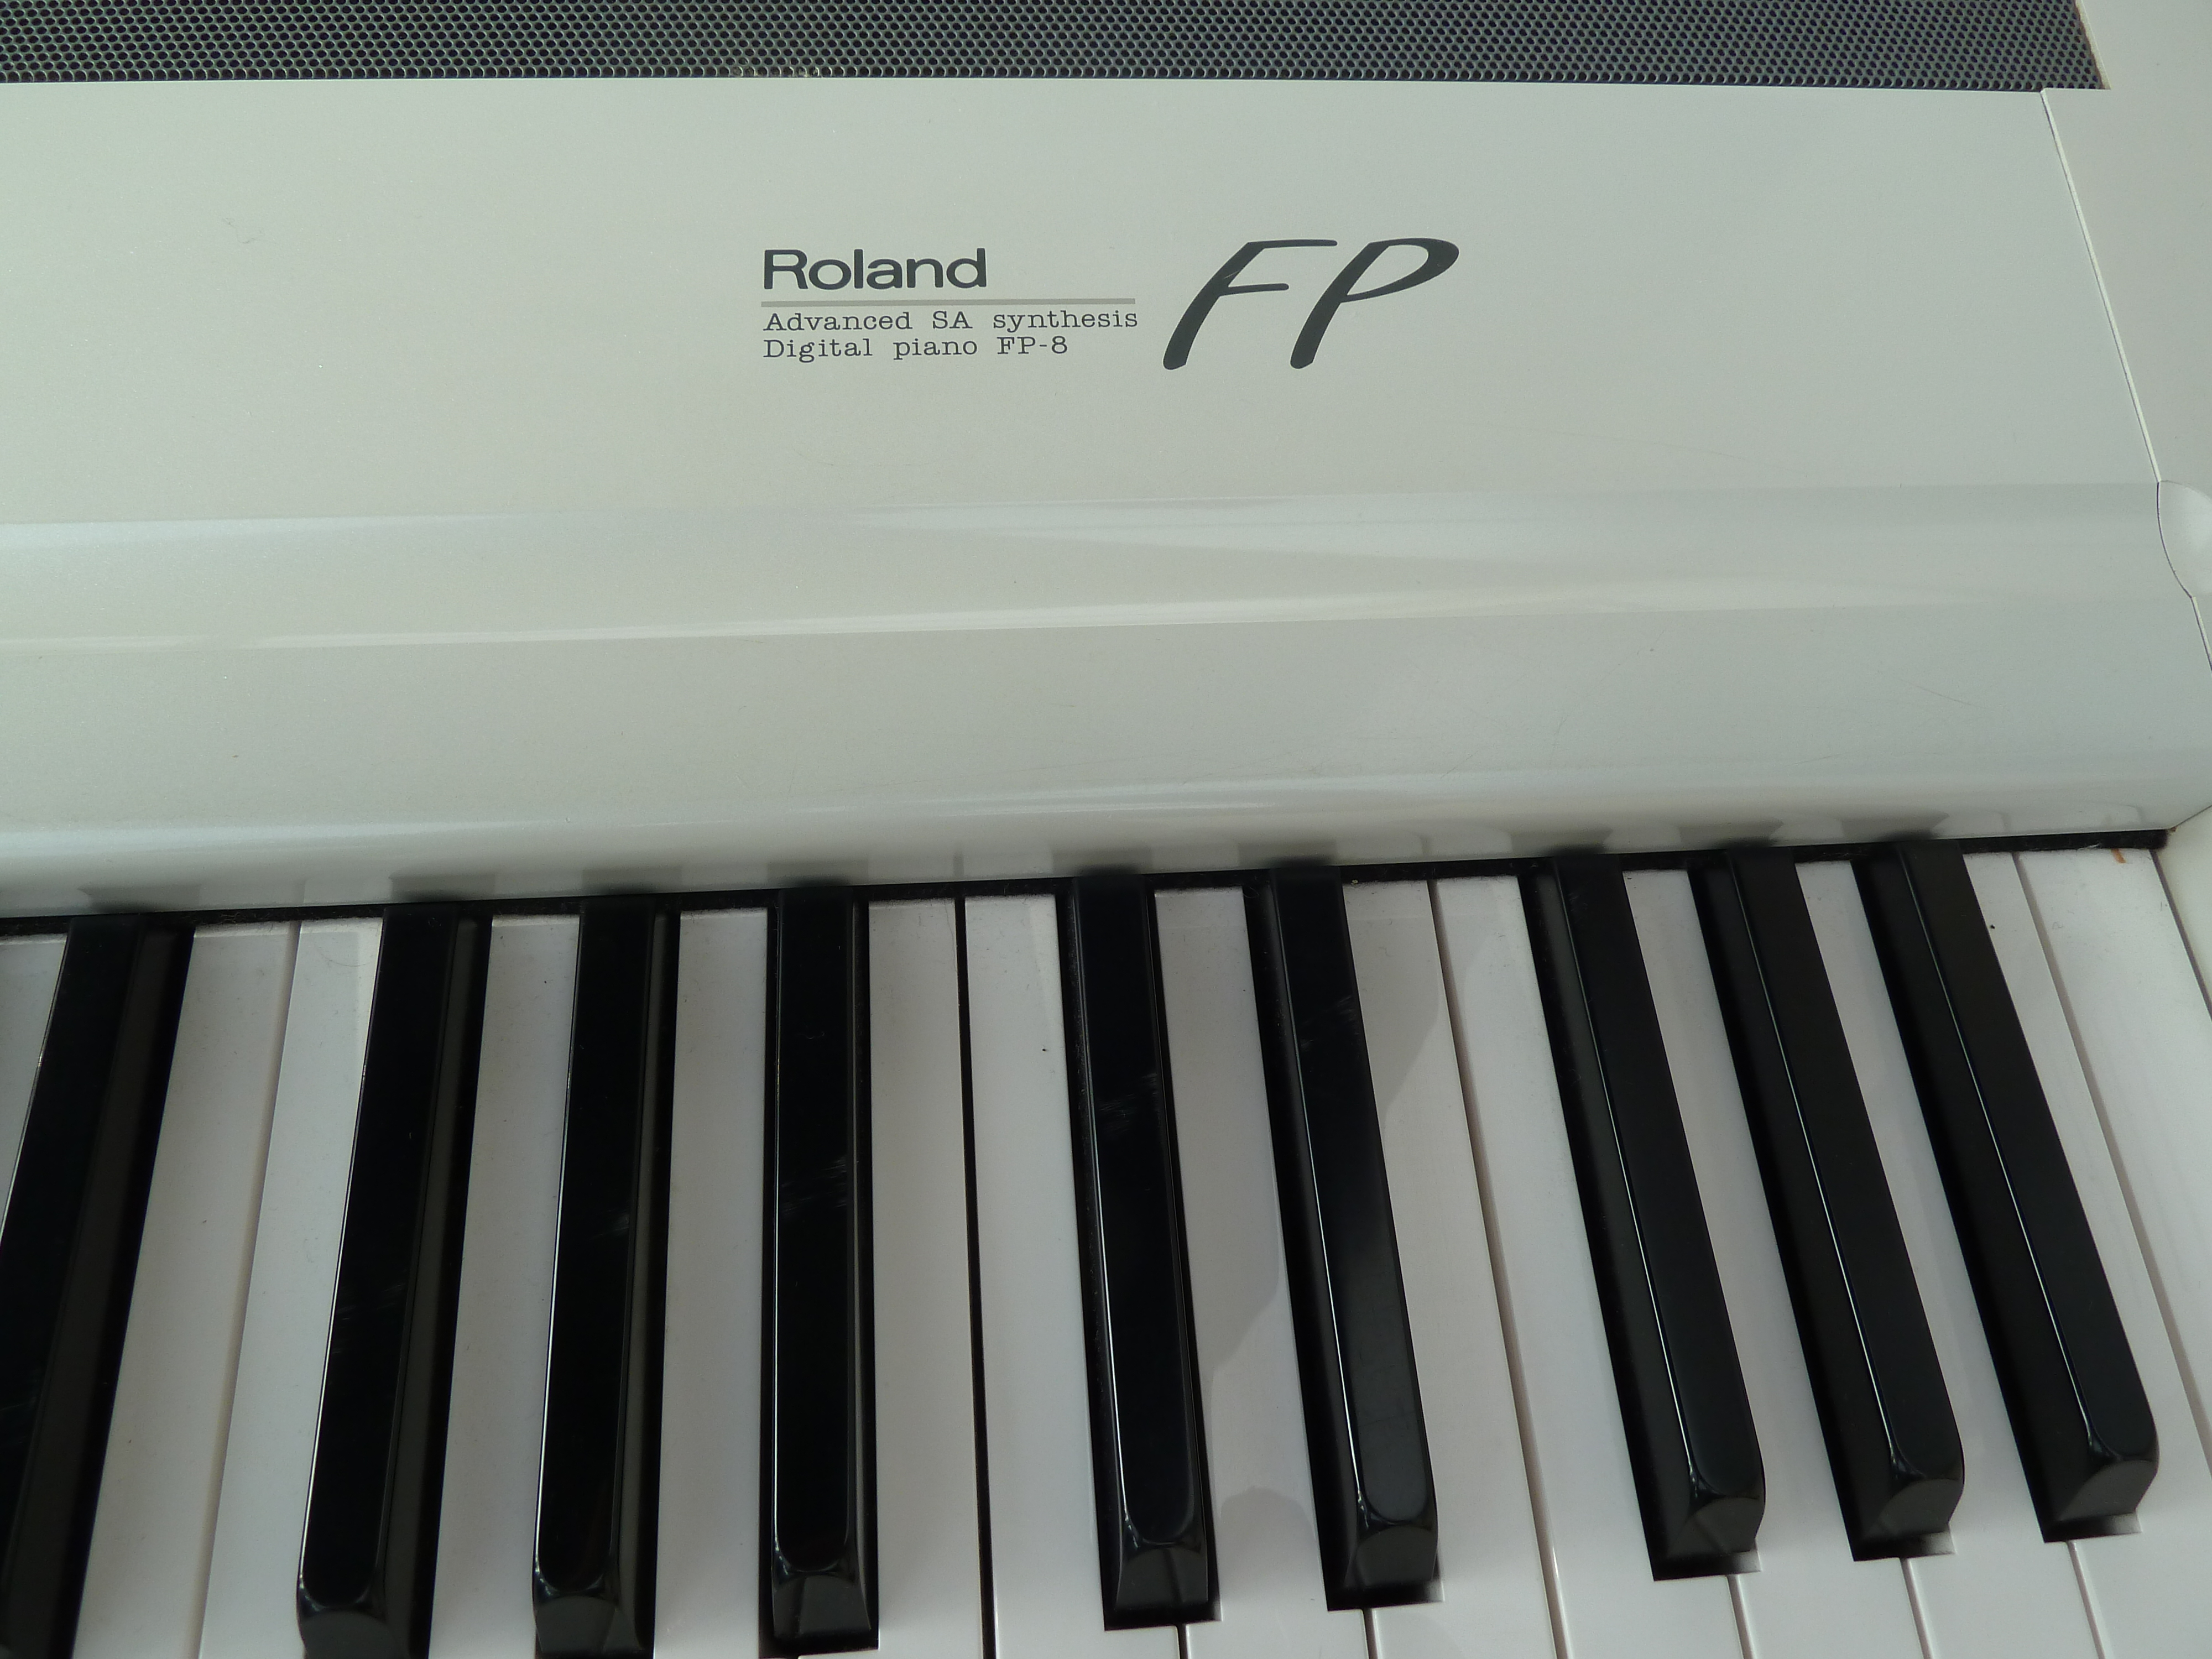 roland fp 8 image 973478 audiofanzine rh en audiofanzine com Digital Piano Roland FP-50 roland fp-8 user manual